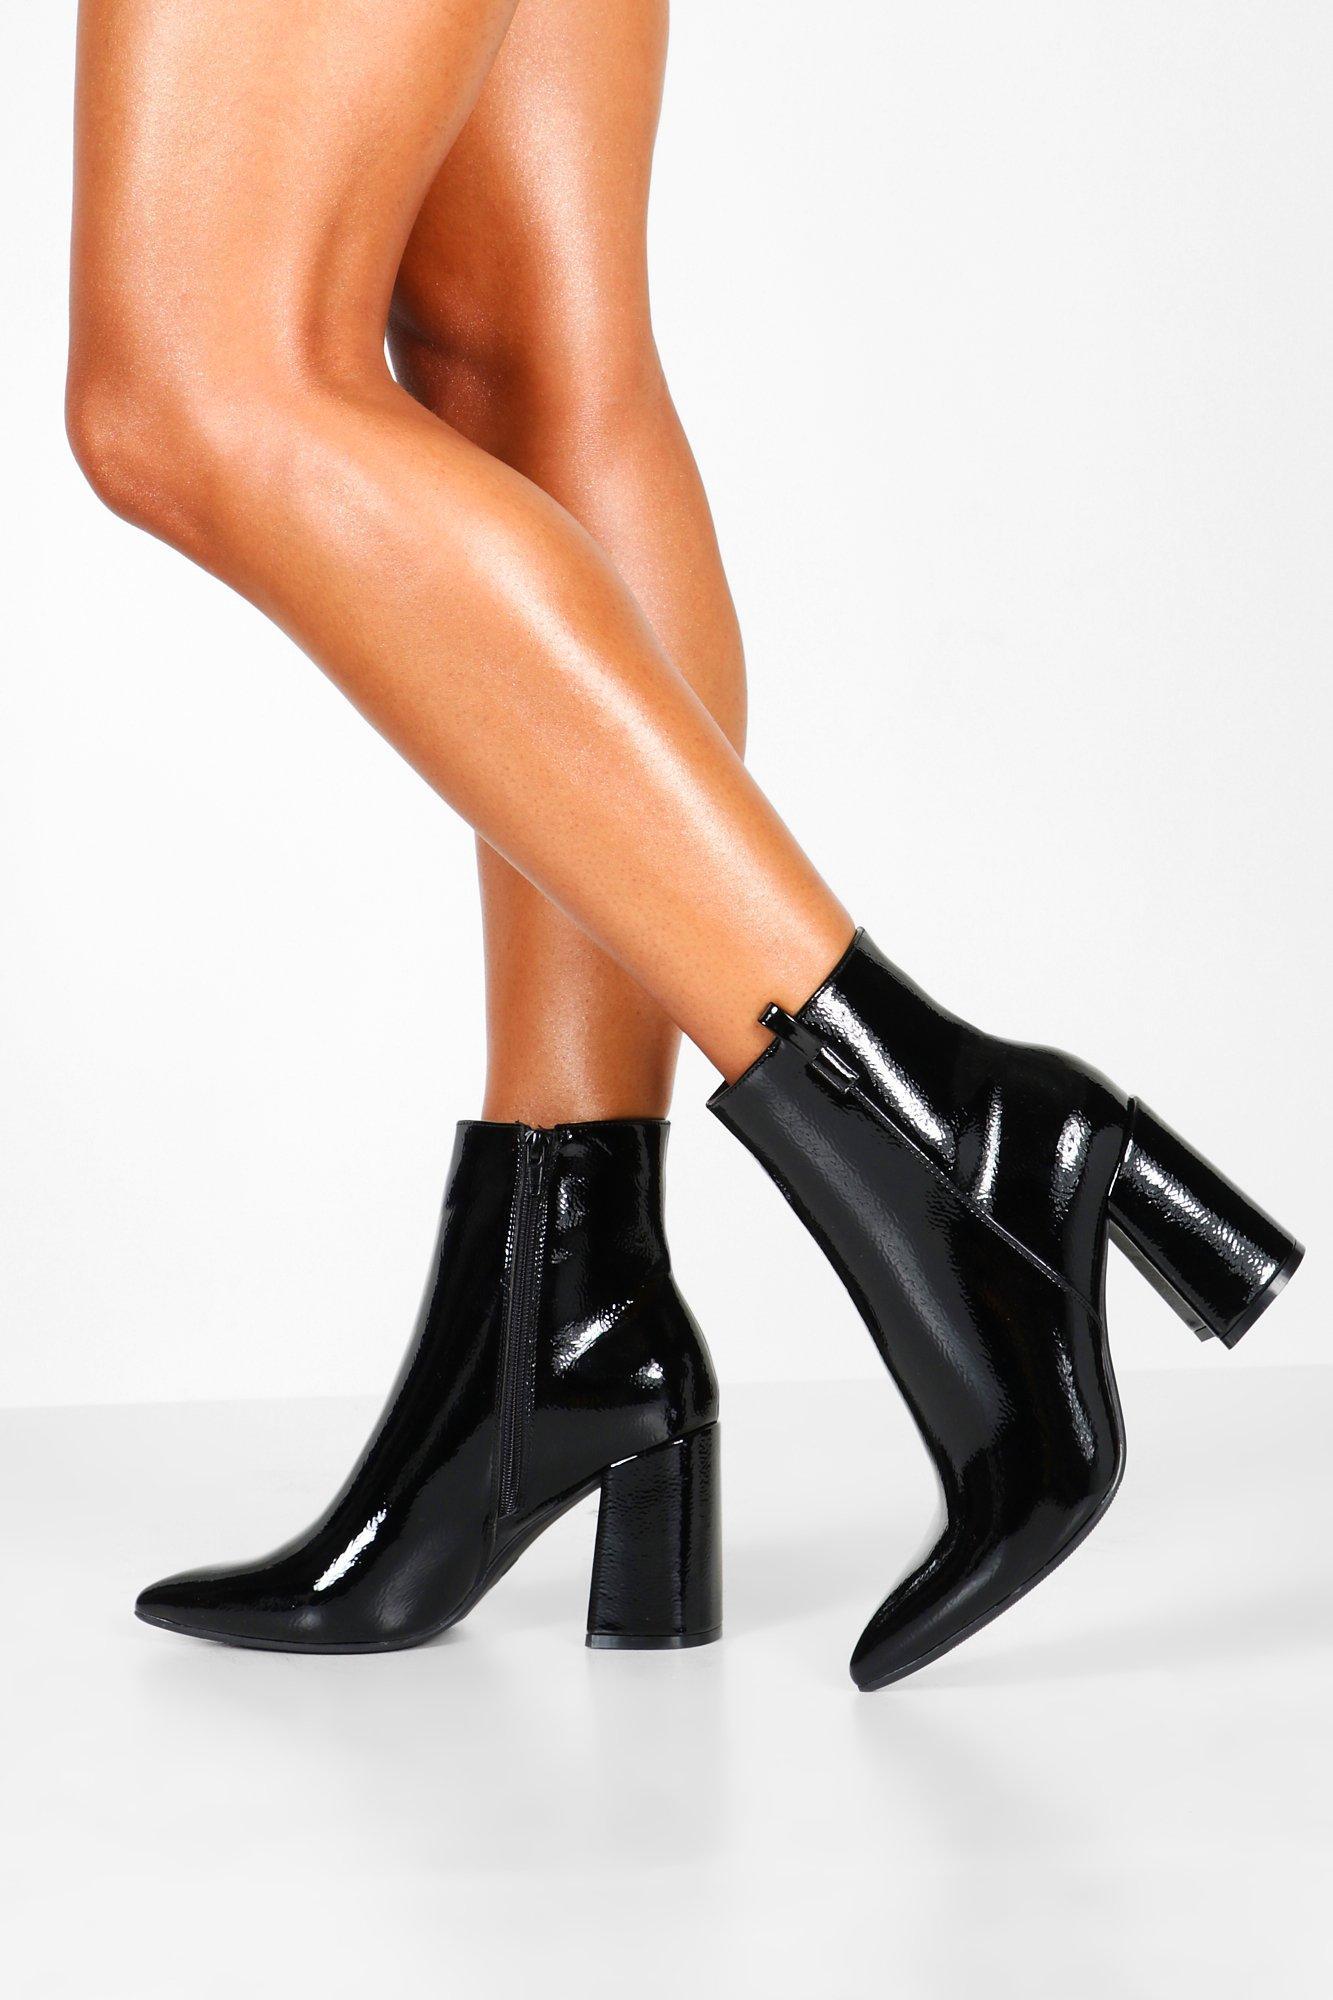 70s Shoes, Platforms, Boots, Heels | 1970s Shoes Womens Pointed Block Heel Sock Boots - Black - 10 $25.60 AT vintagedancer.com